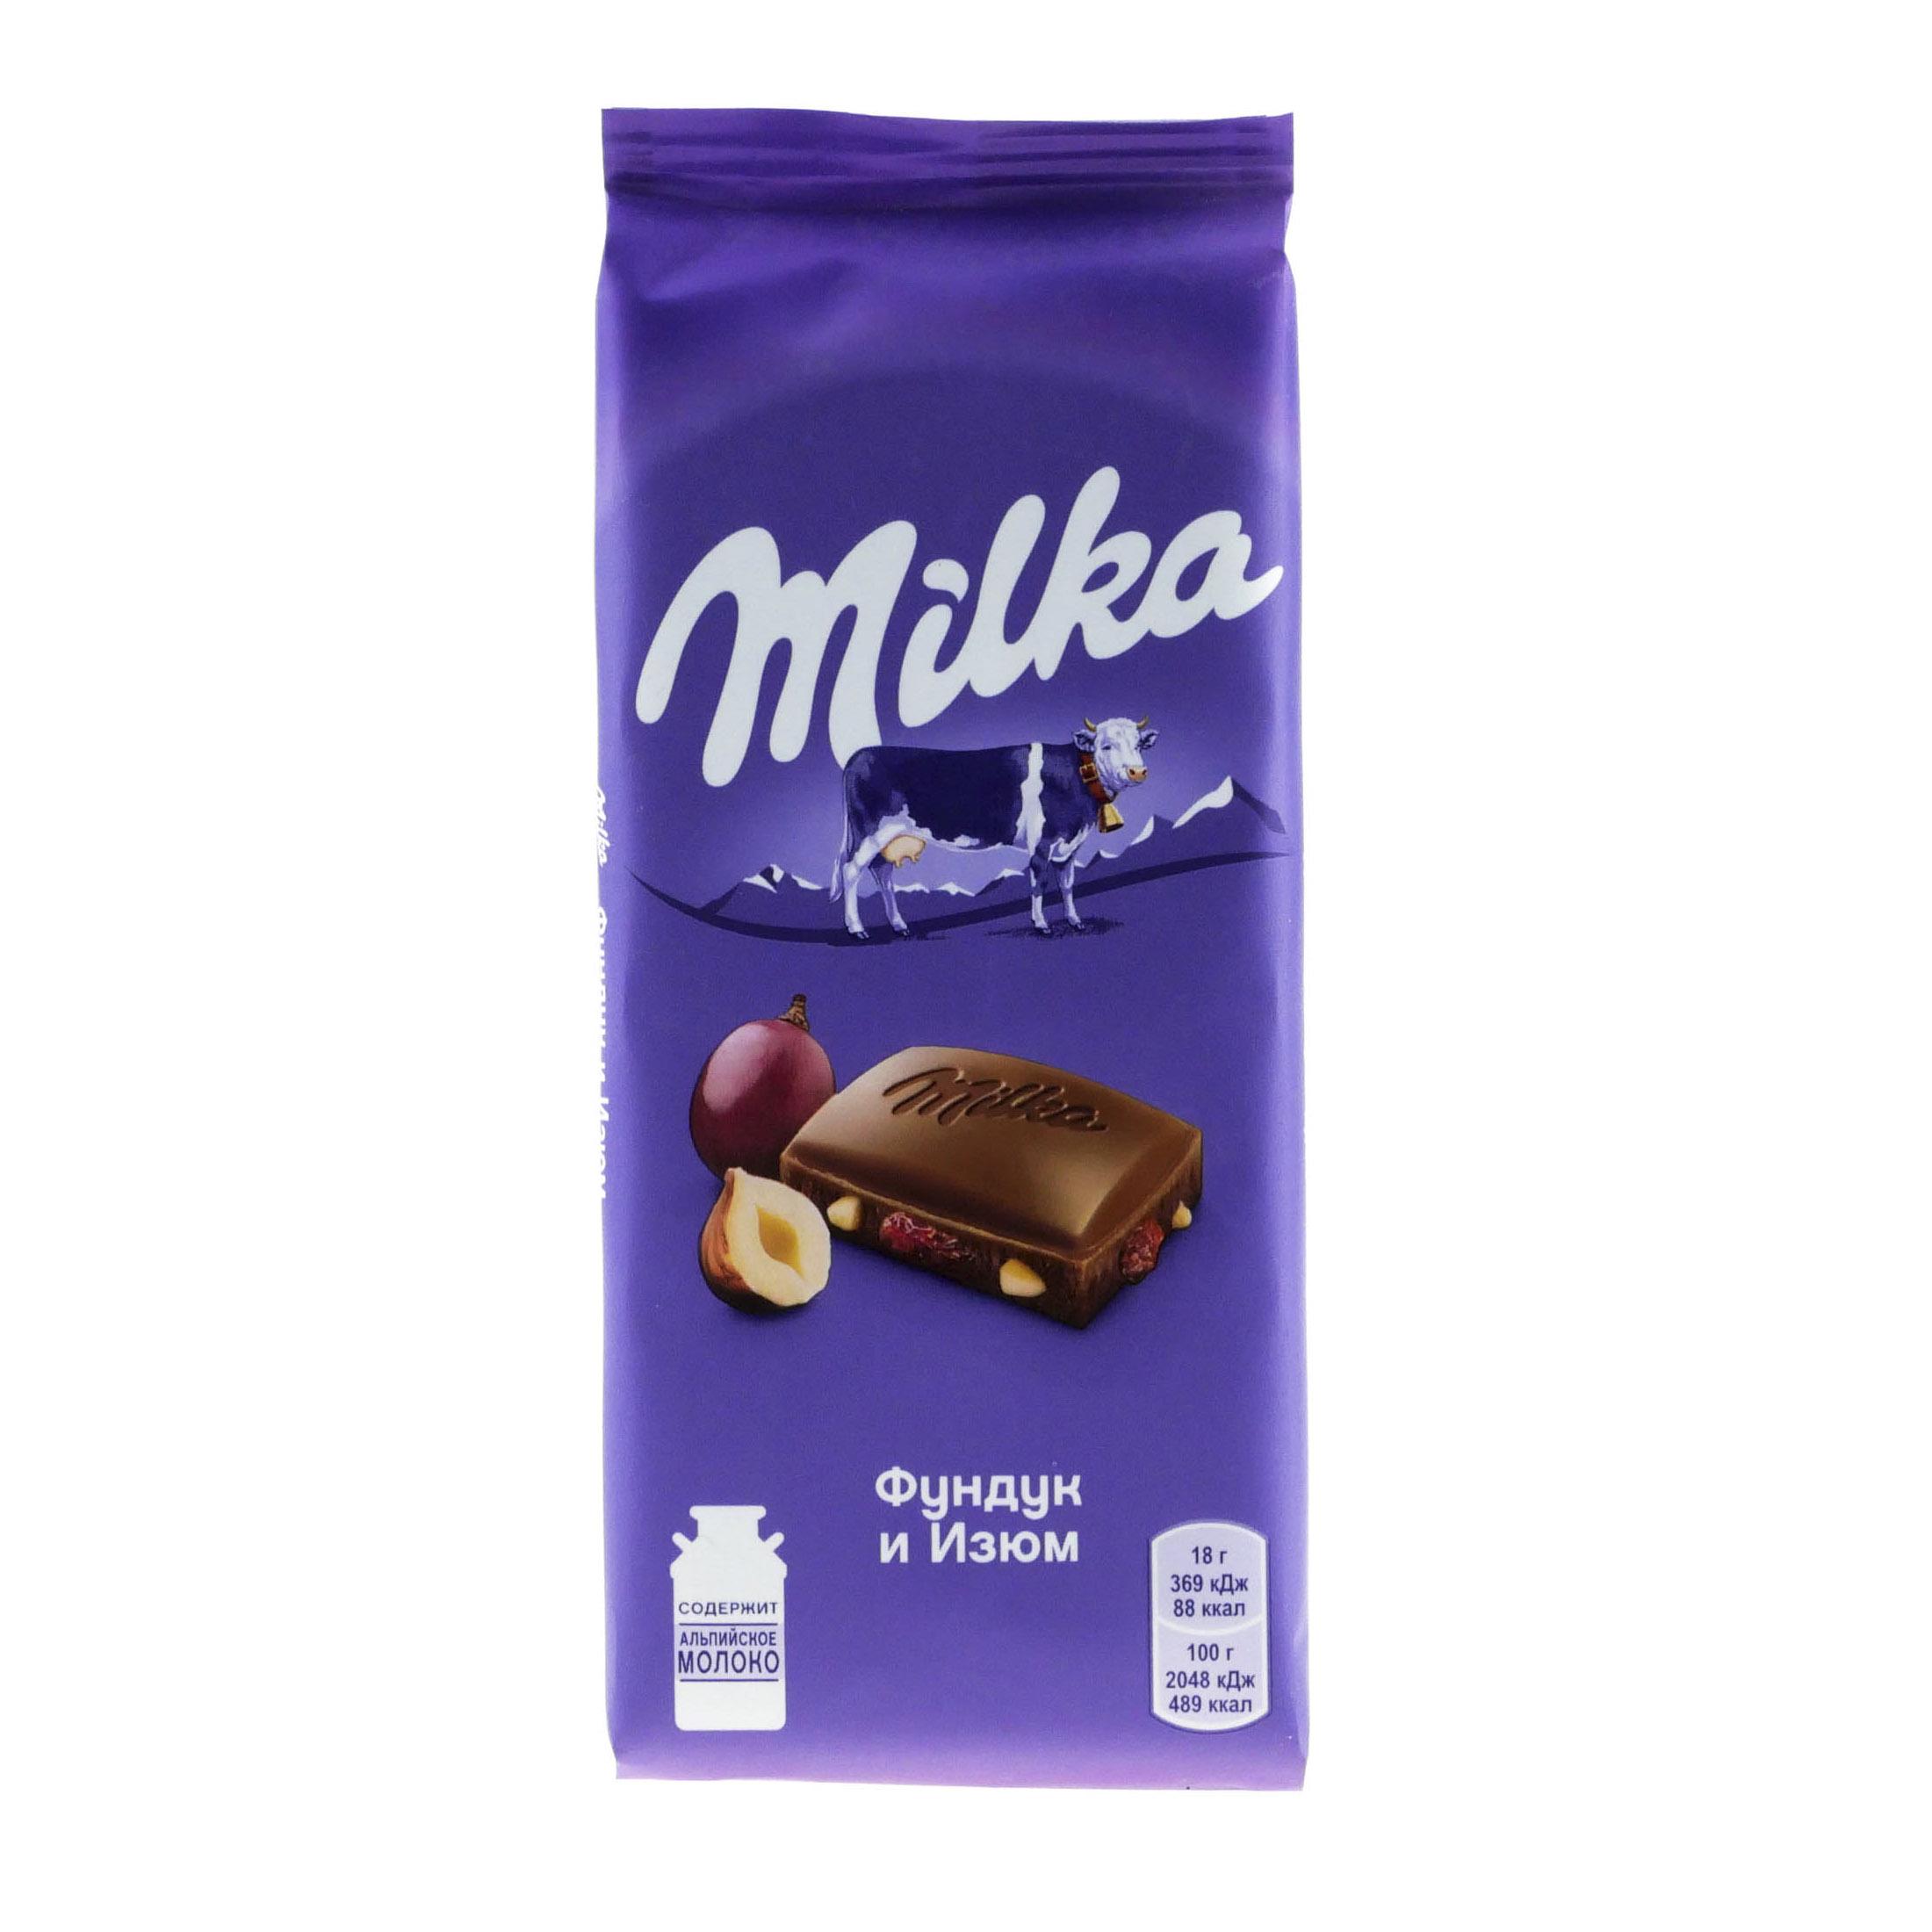 шоколад dove молочный с инжиром 90 г Шоколад Milka молочный с фундуком и изюмом 90 г